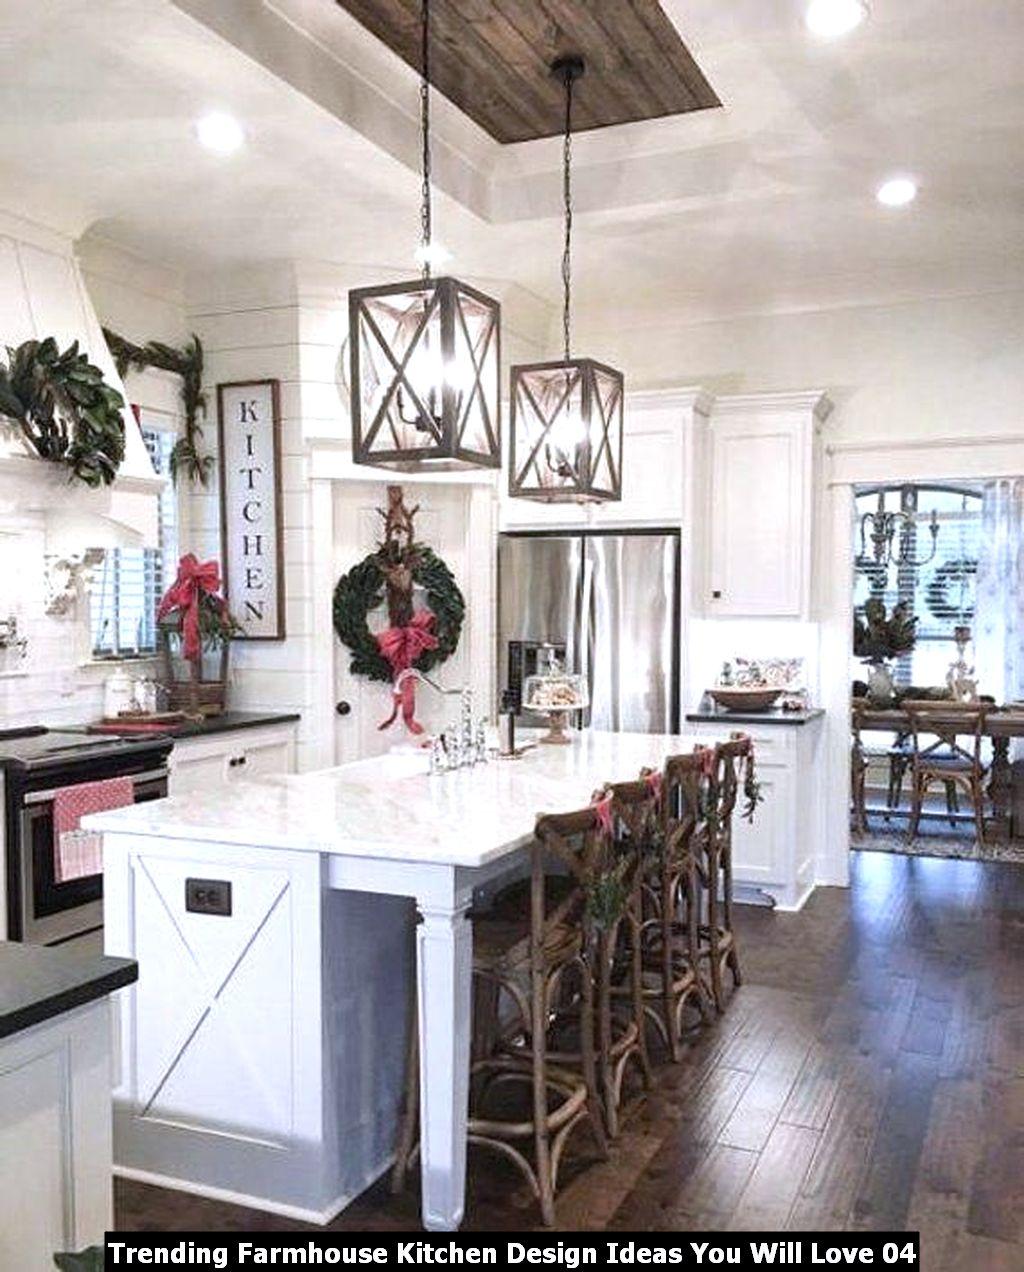 Trending Farmhouse Kitchen Design Ideas You Will Love 04